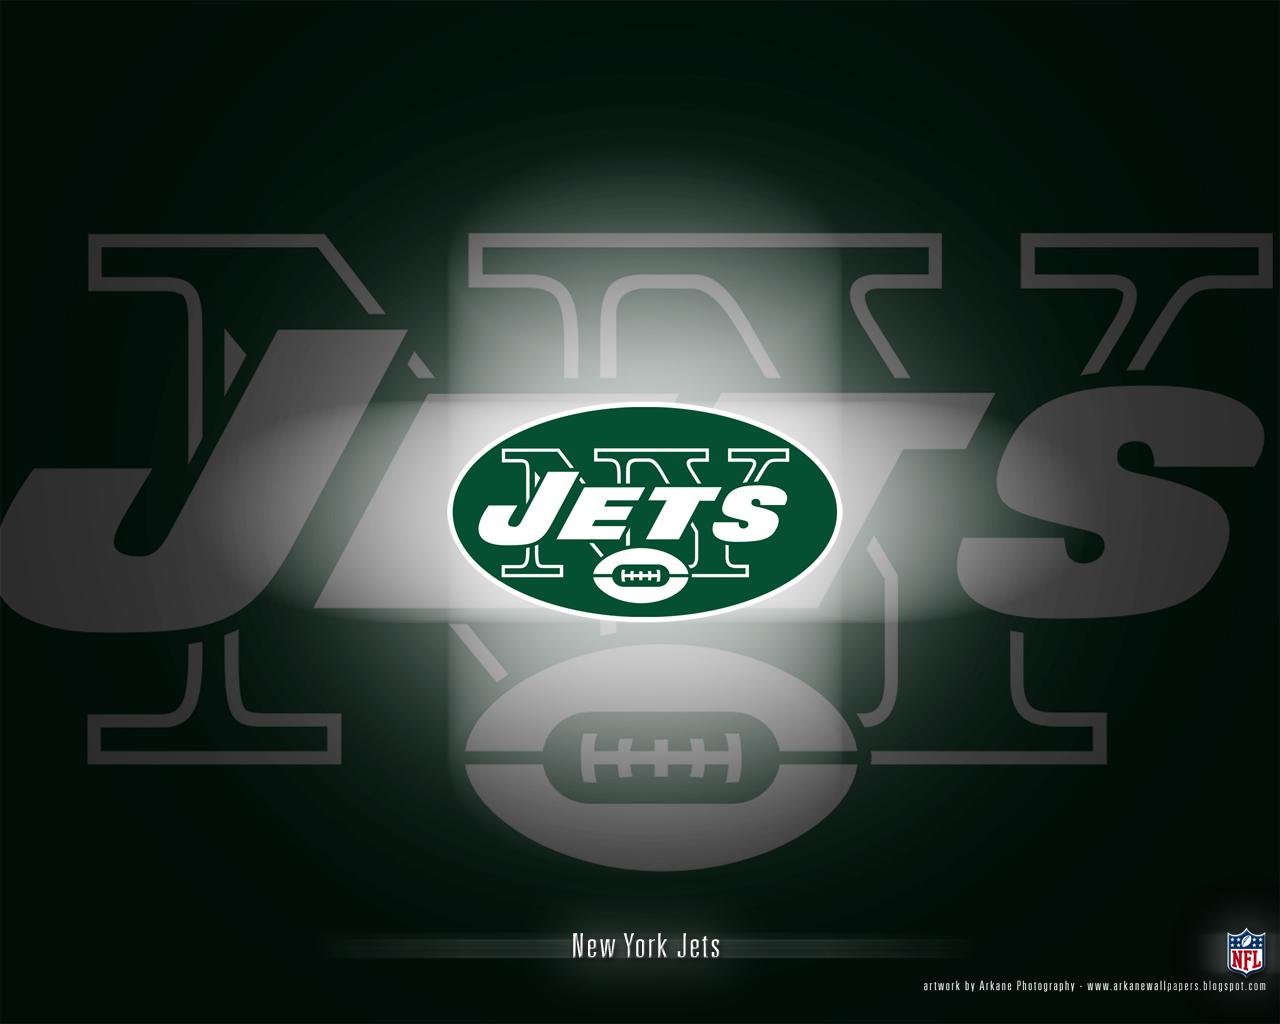 Darrelle Revis Jets Wallpaper